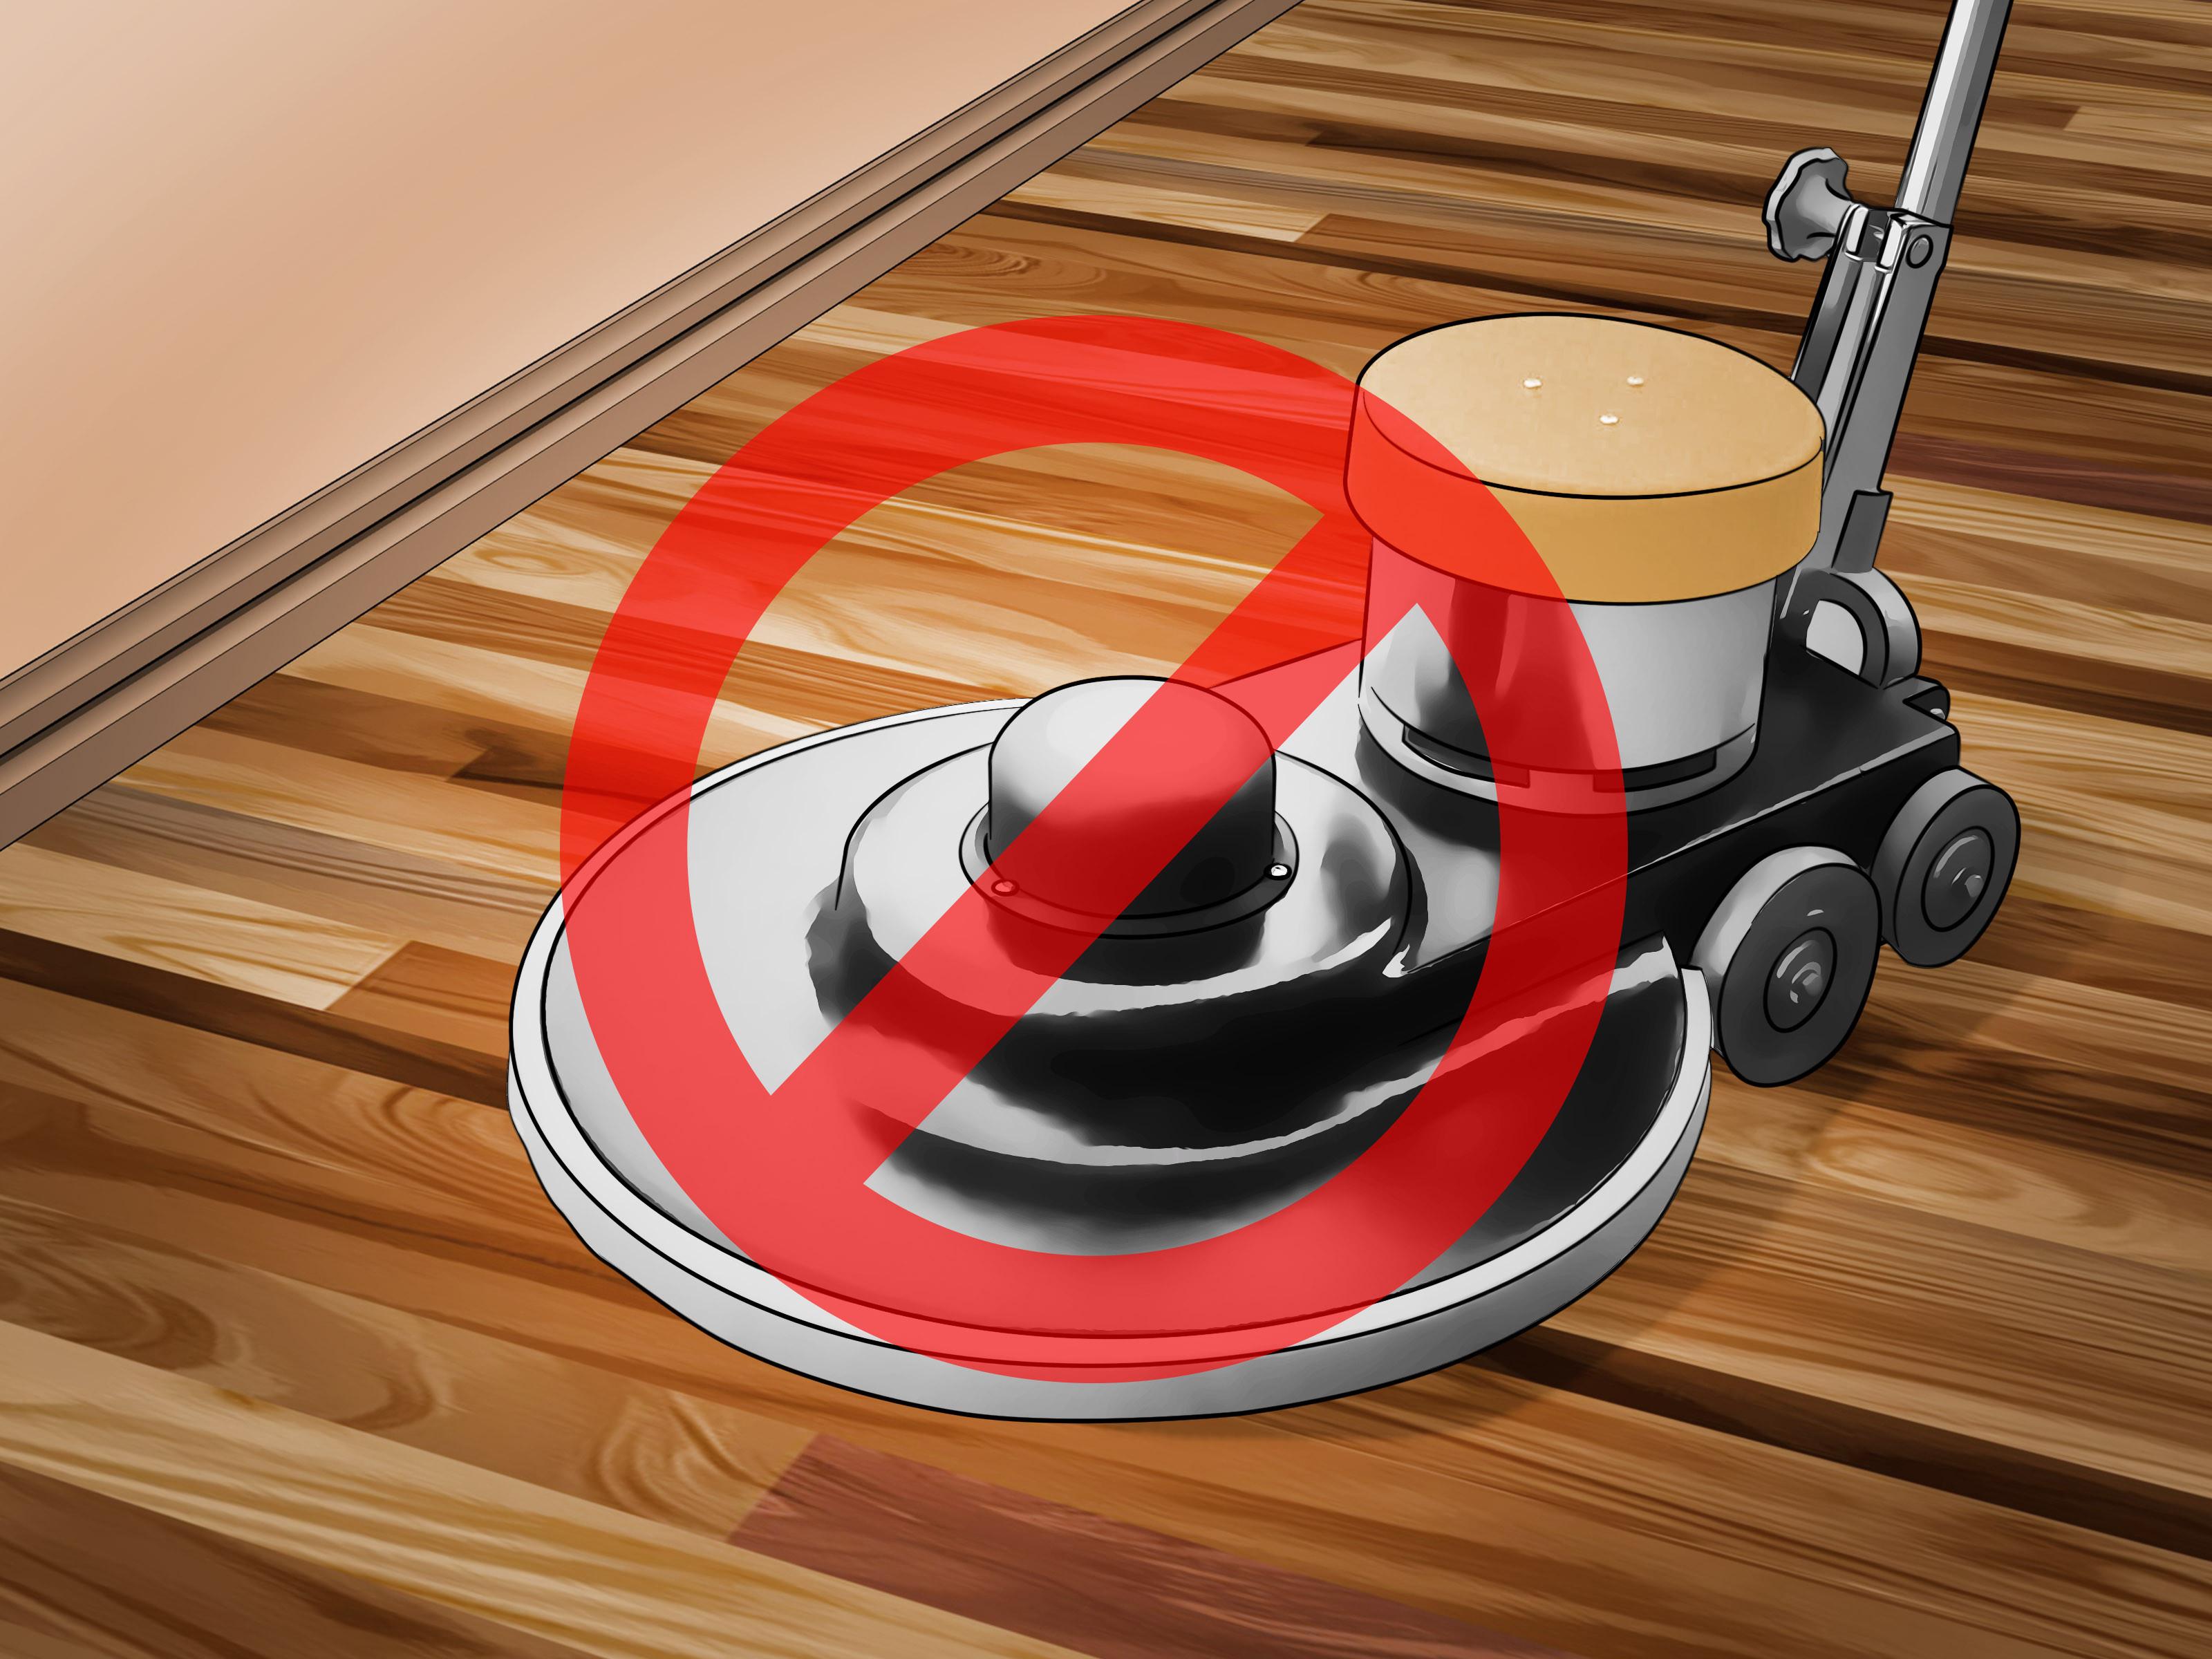 glue down engineered hardwood flooring of 4 ways to clean polyurethane wood floors wikihow in clean polyurethane wood floors step 15